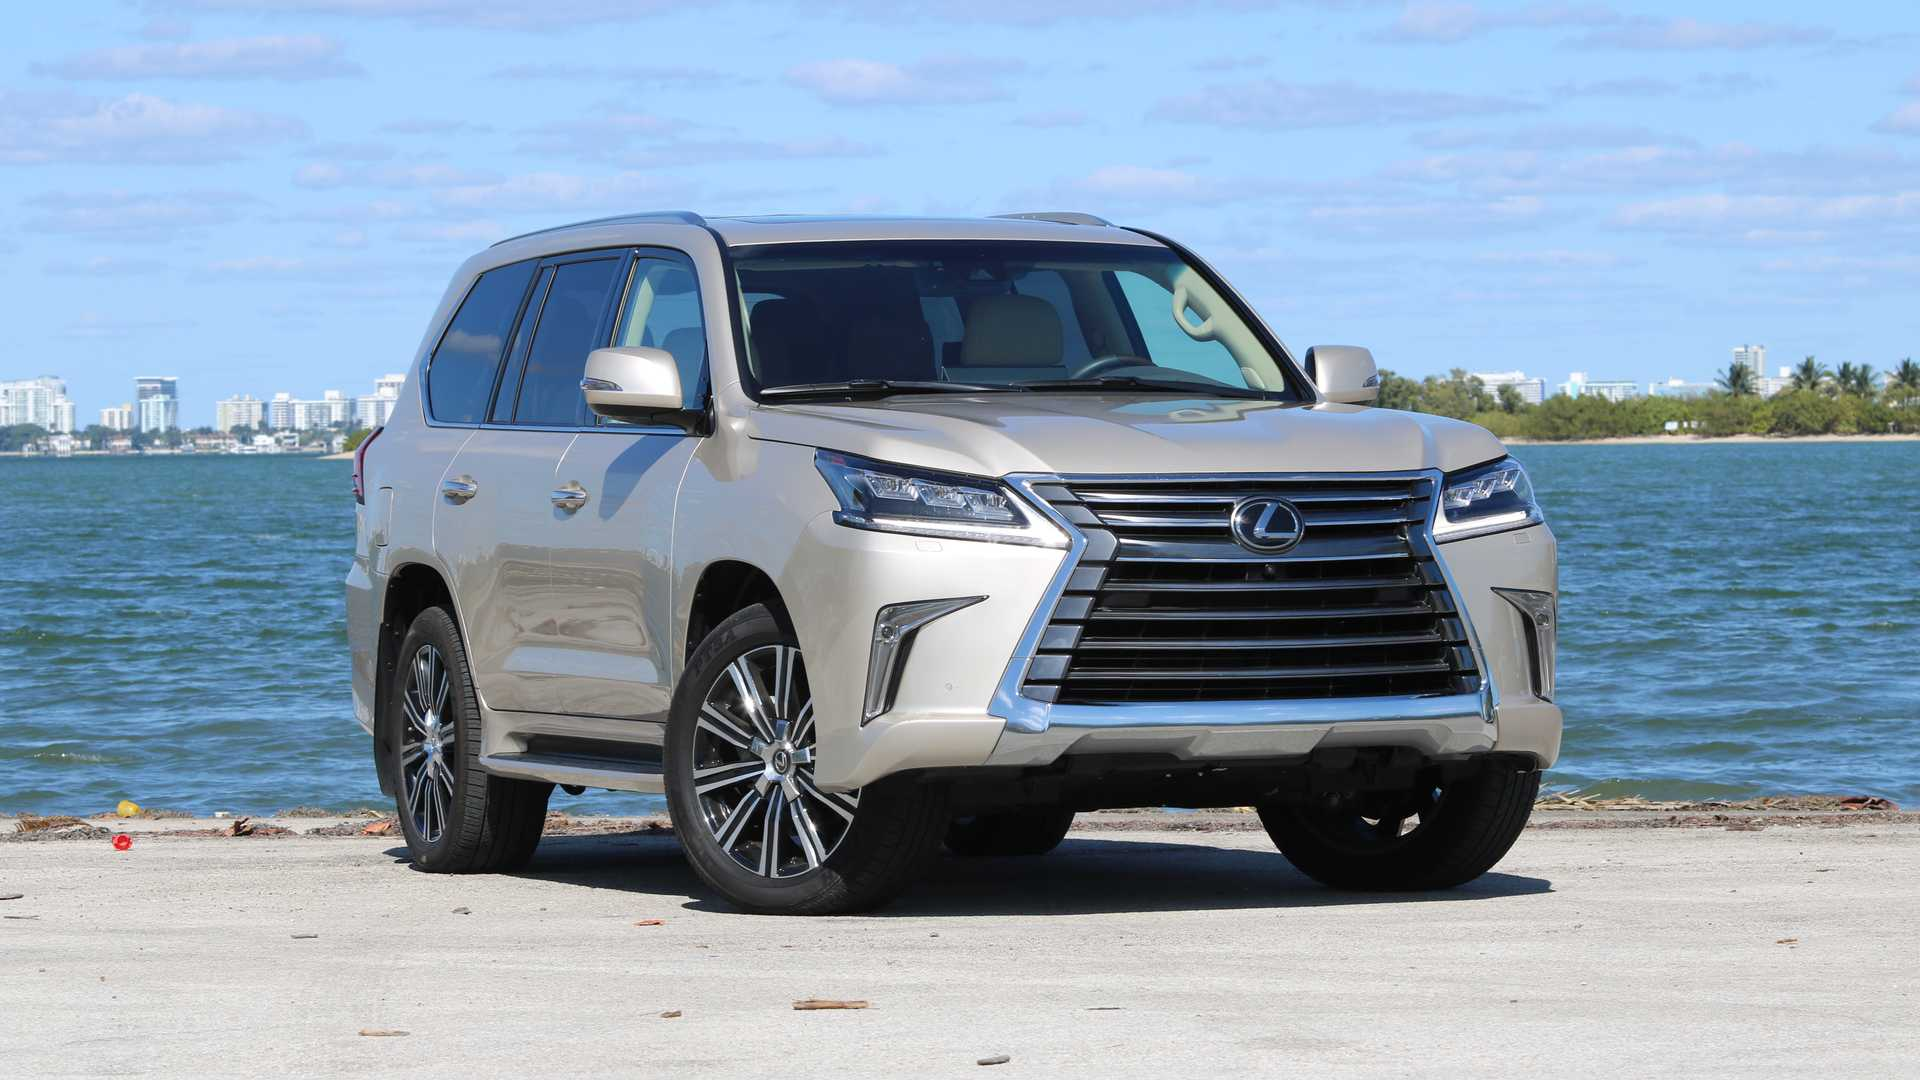 2019 Lexus Lx 570 Pros And Cons